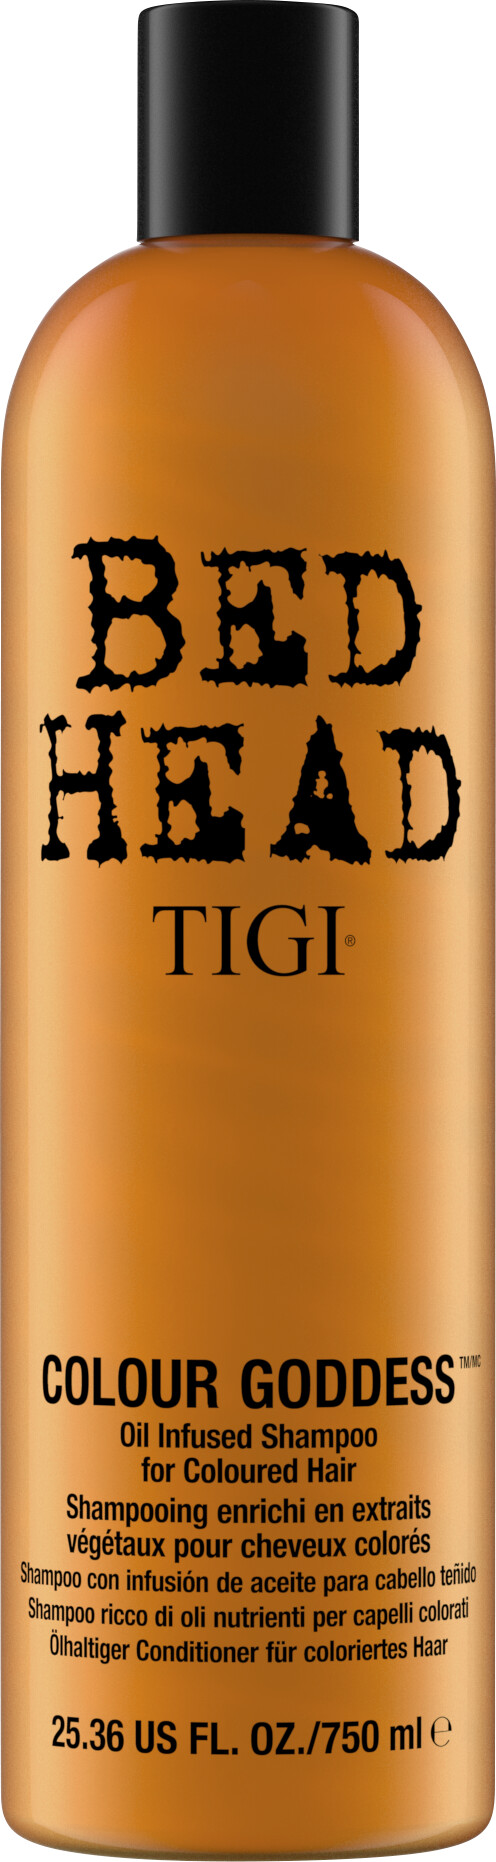 TIGI Bed Head Colour Goddess Oil Infused Shampoo 750ml